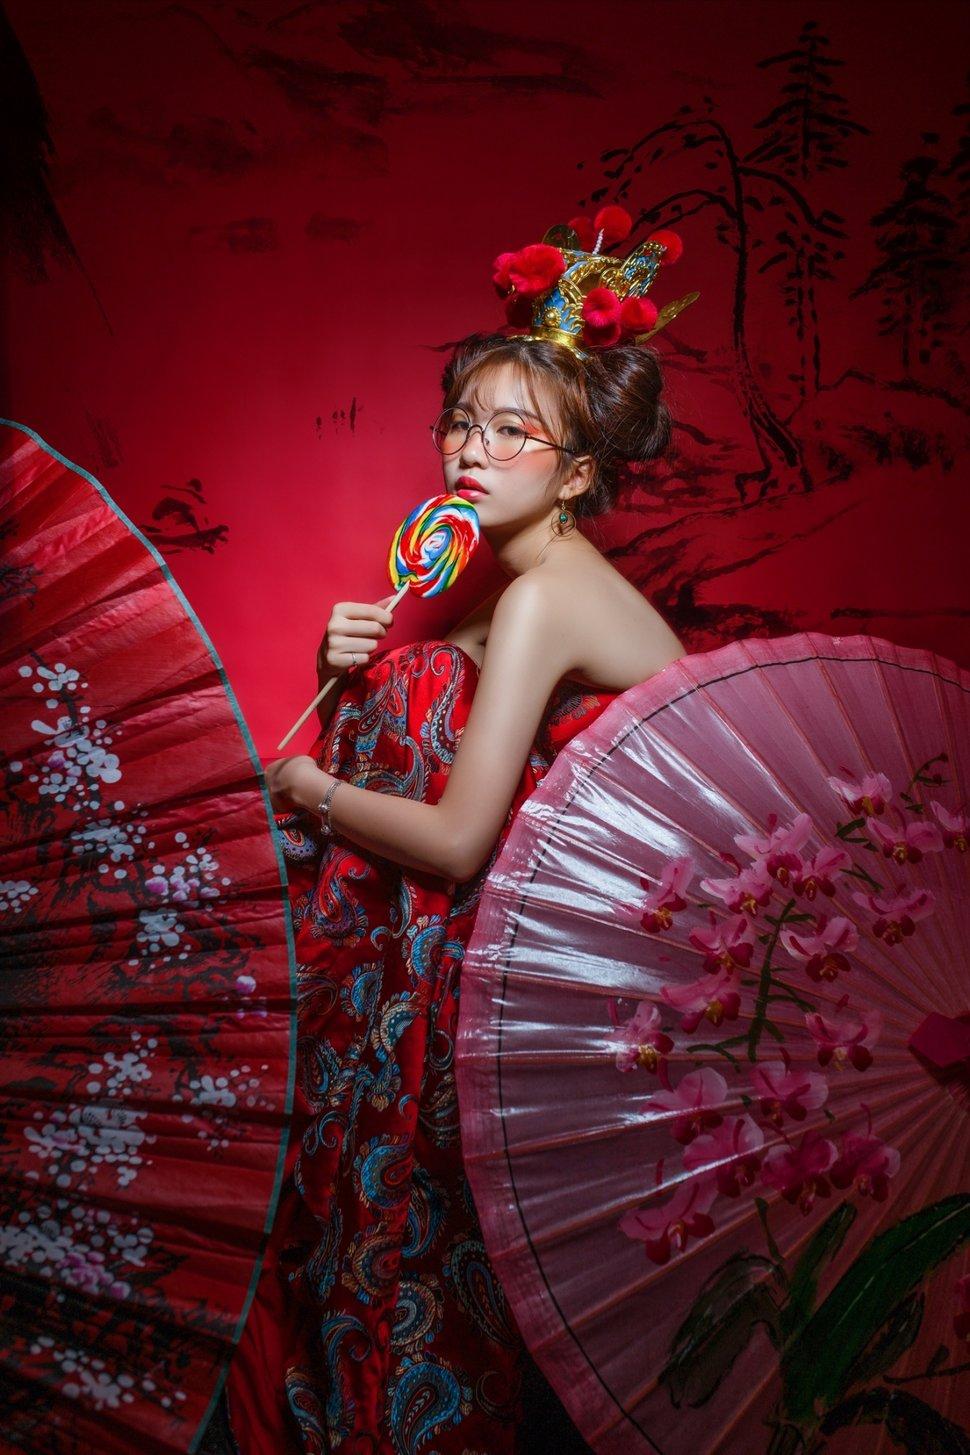 20180825_181121_0003 - Zona時尚美甲x新娘秘書整體造型工作室《結婚吧》